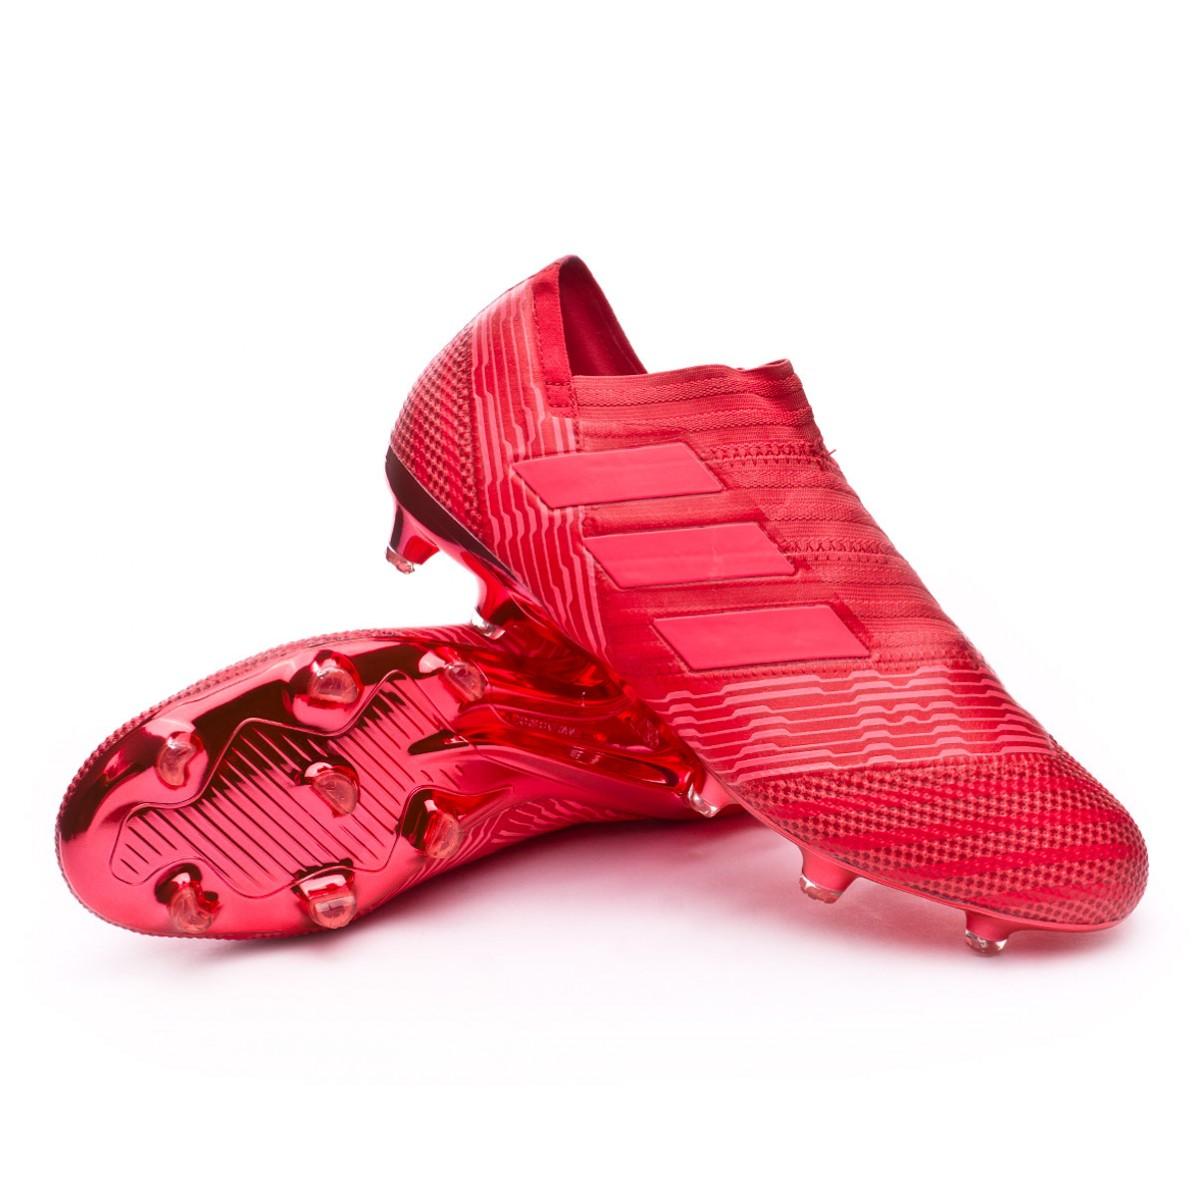 Boot adidas Nemeziz 17+ Agility FG Real coral-Red zest - Foo